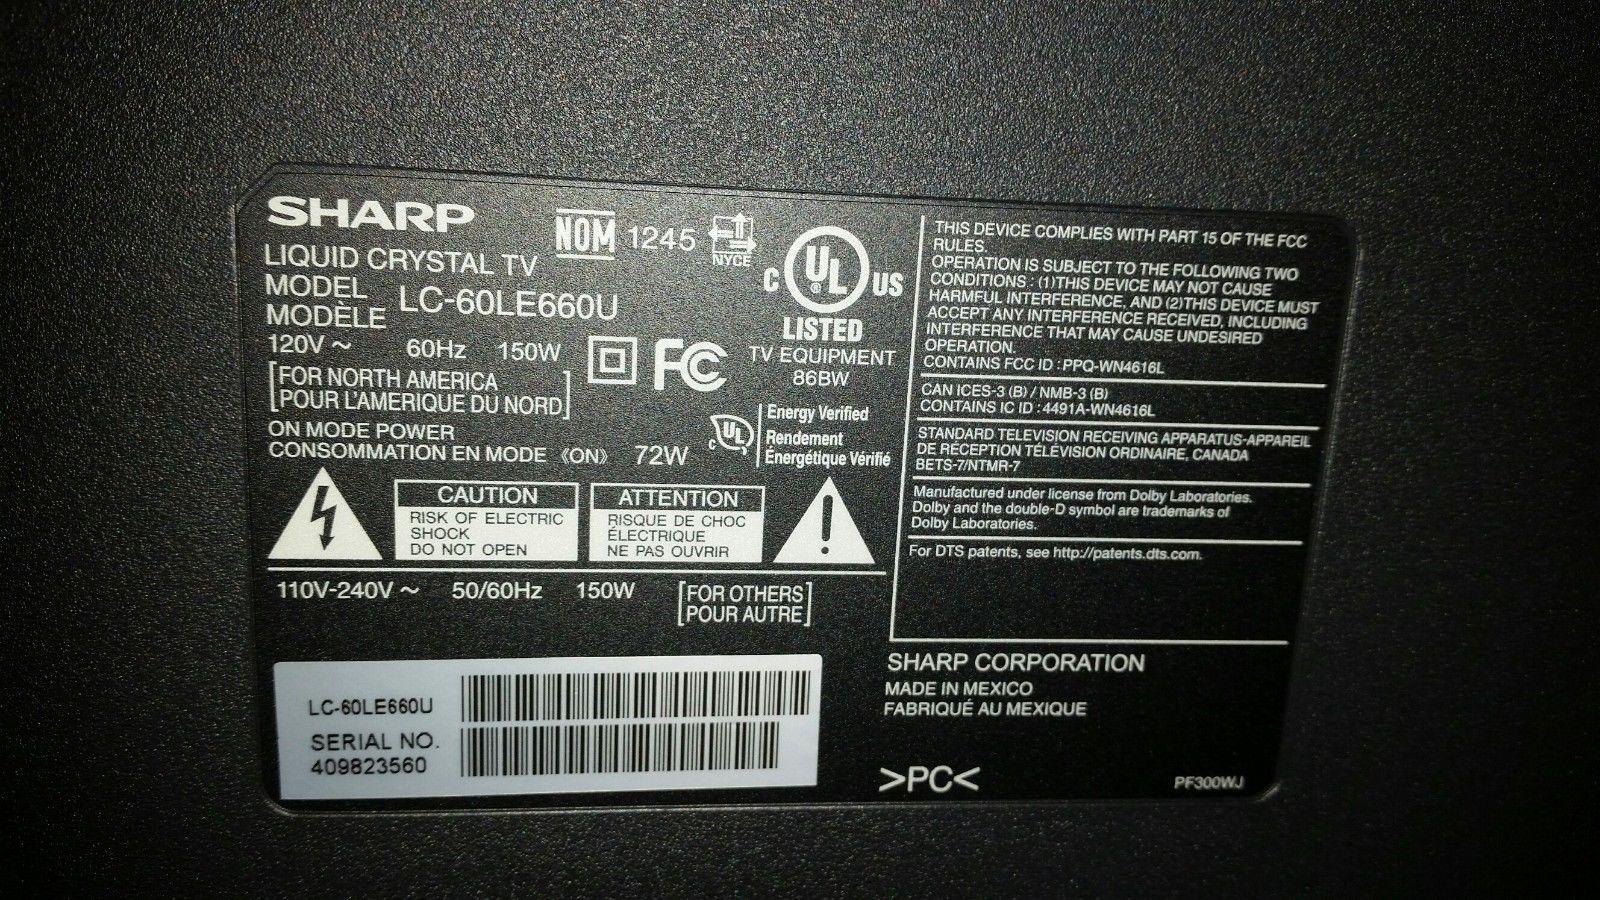 Sharp LC-60LE660U -LVDS Cable (QCNW-P260WJZZ)